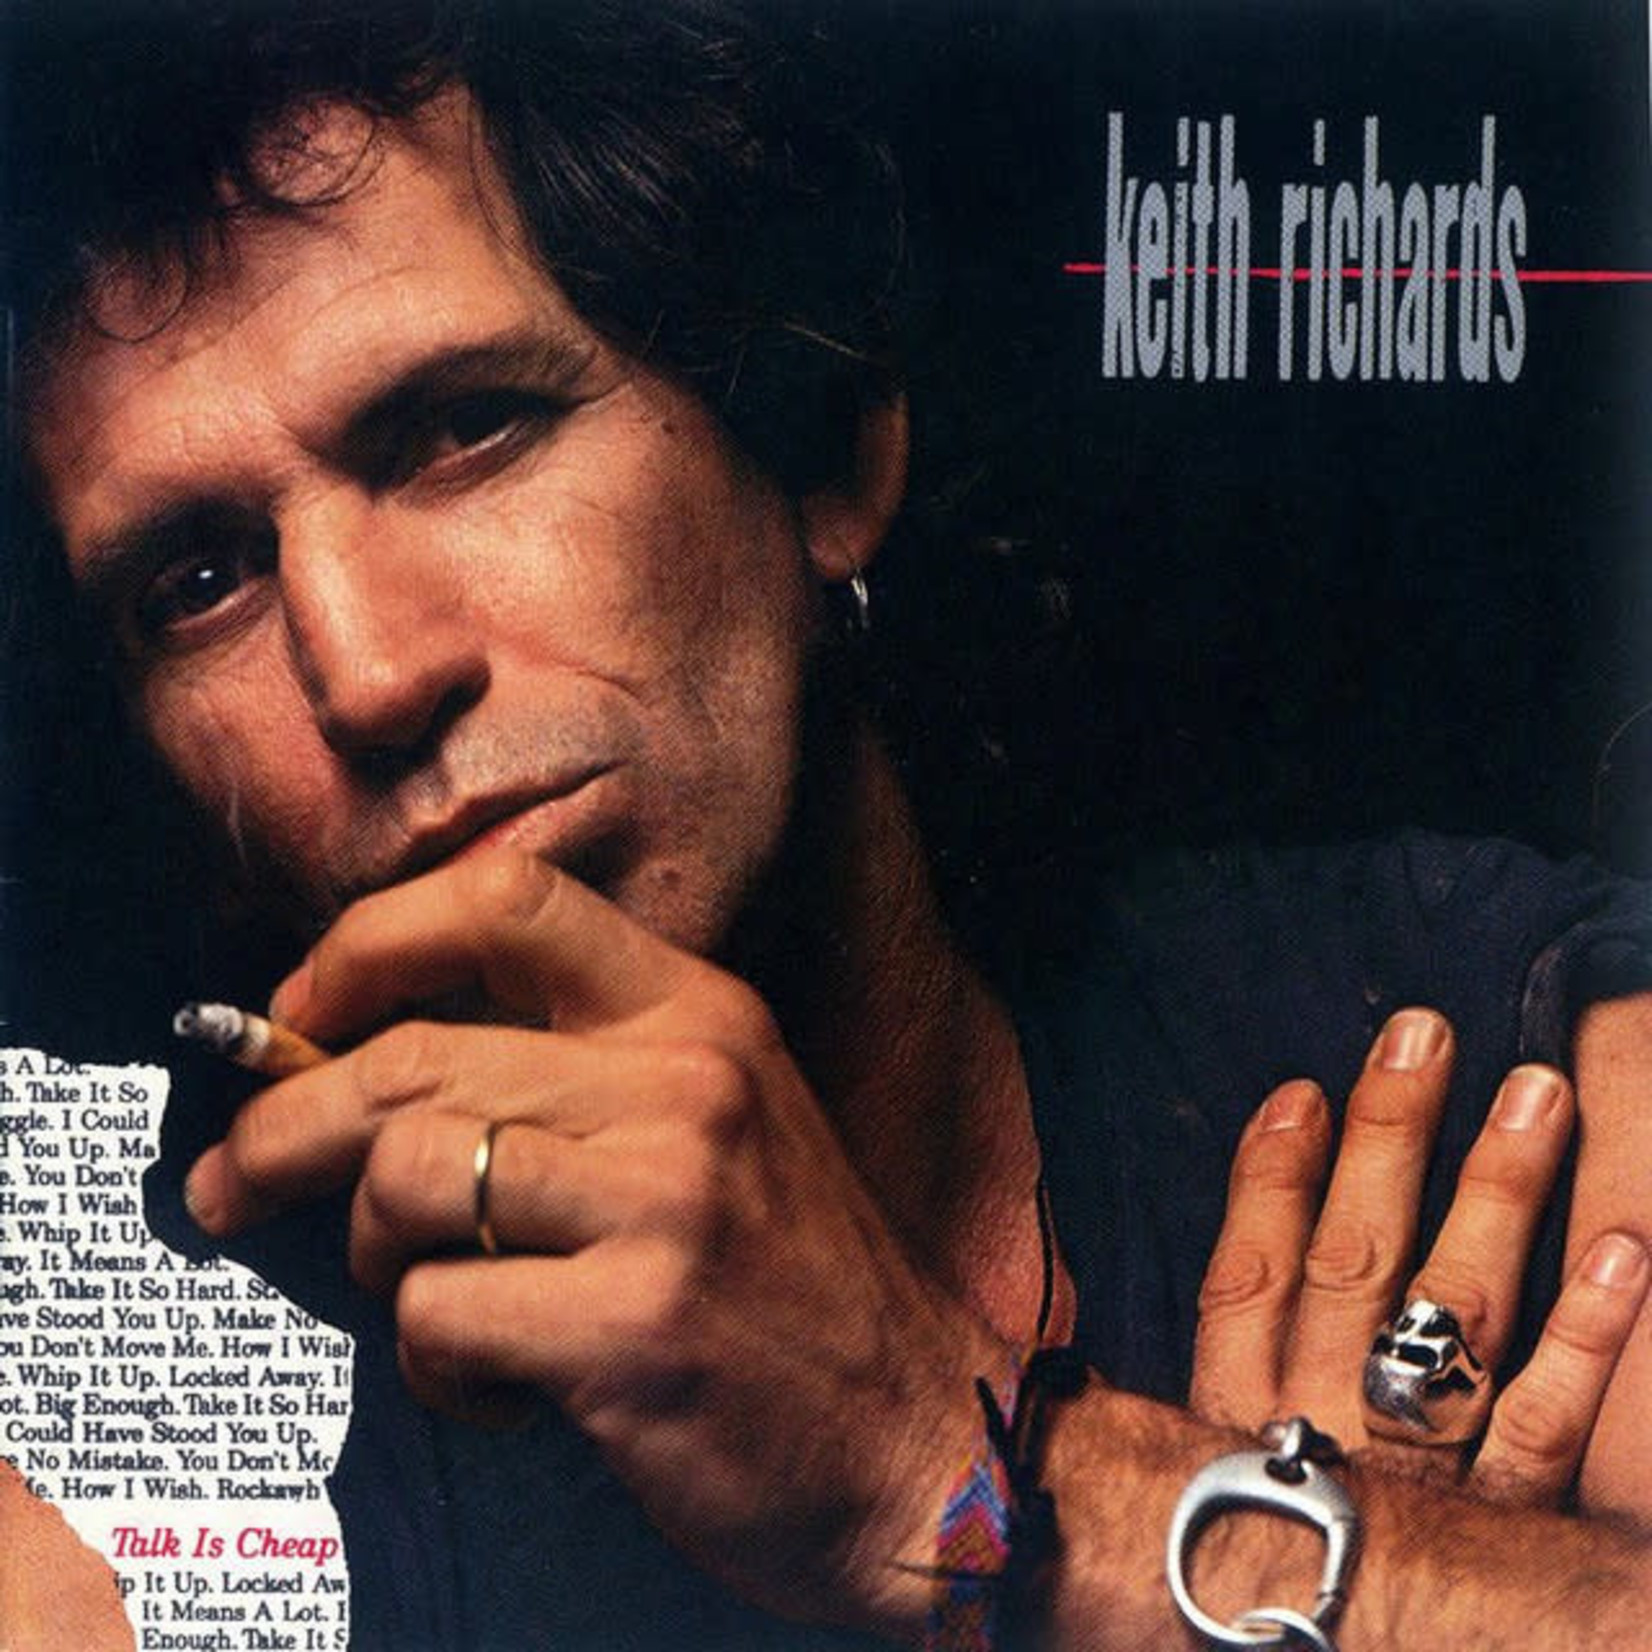 Vinyl Keith Richards - Talk Is Cheap